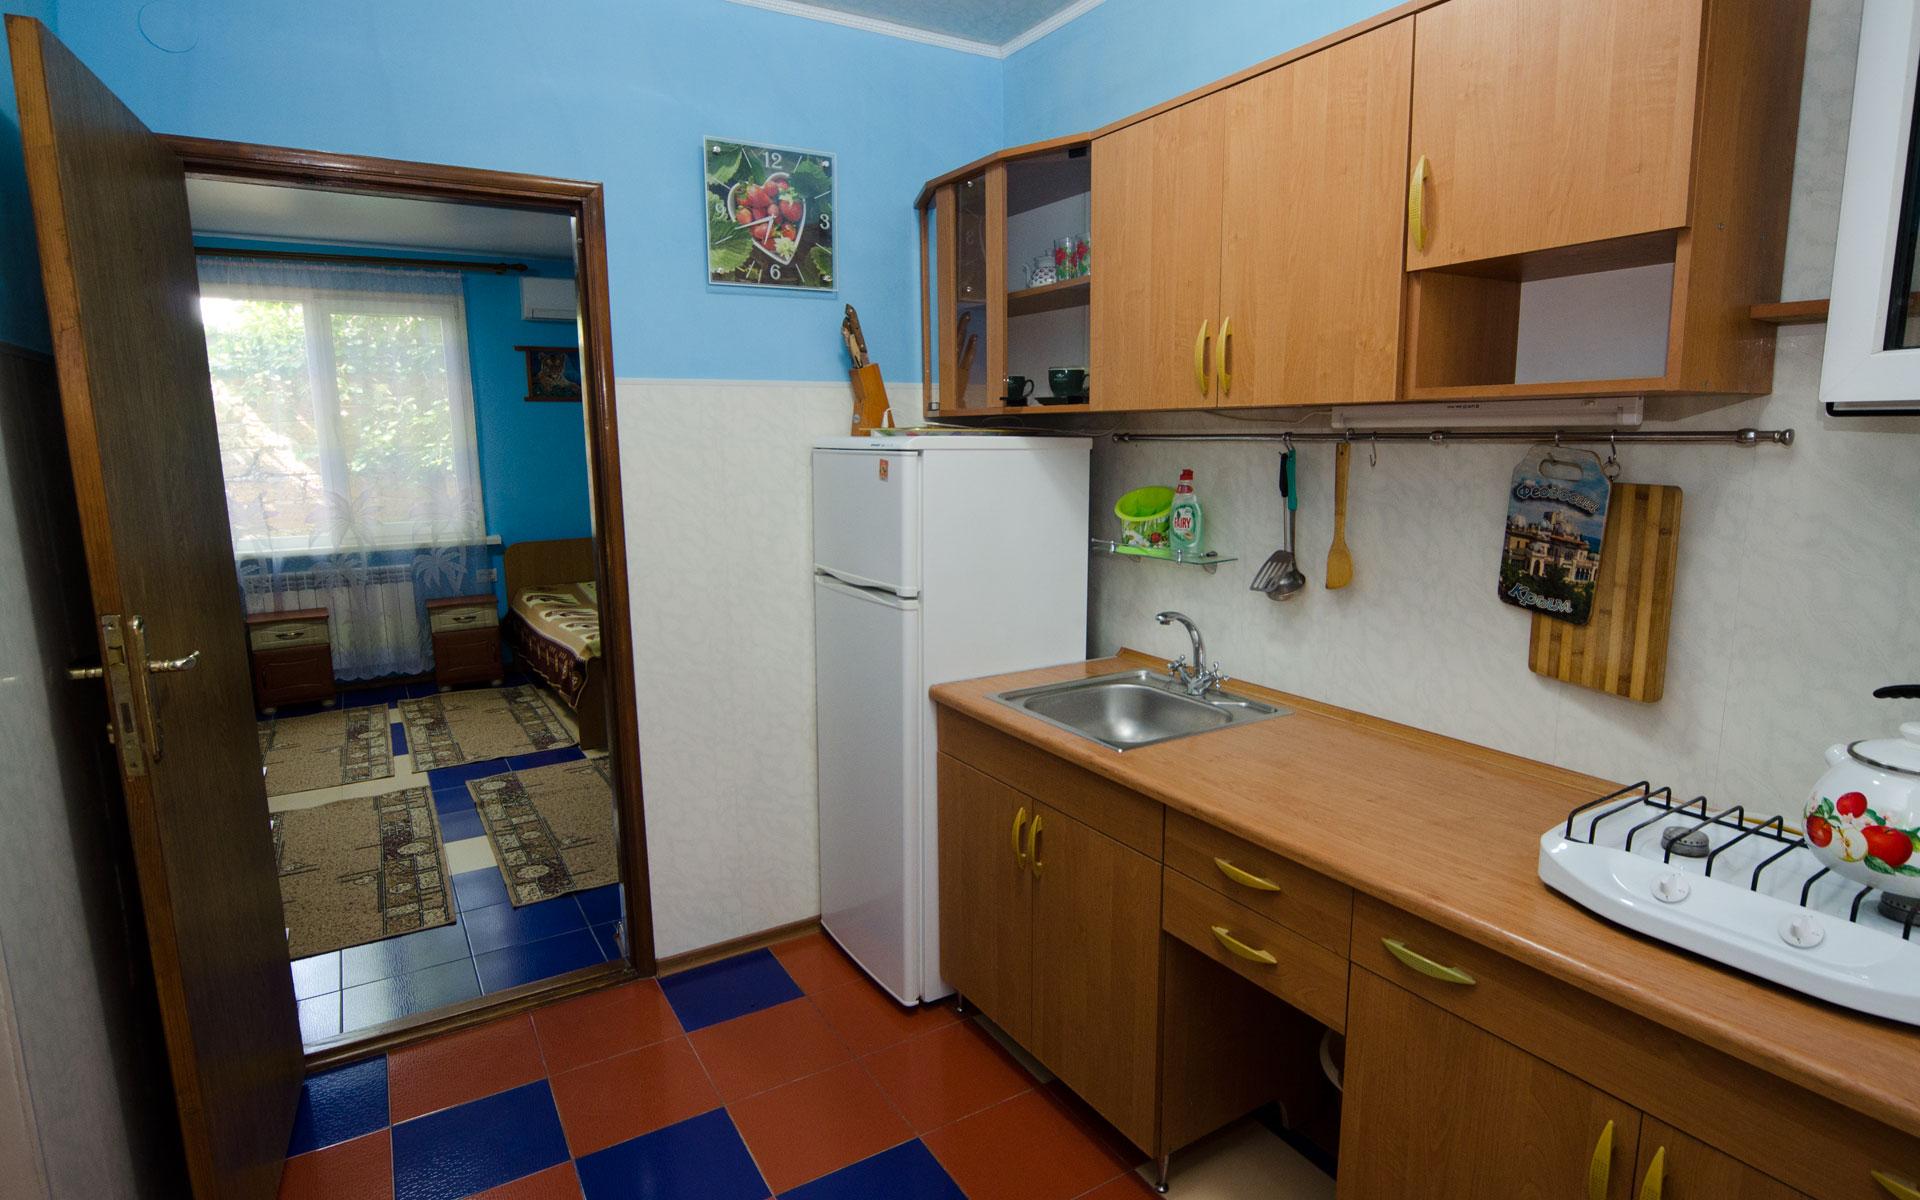 Кухня. Квартира 2. 2 квартиры на ул. Гайдара. Заозёрное